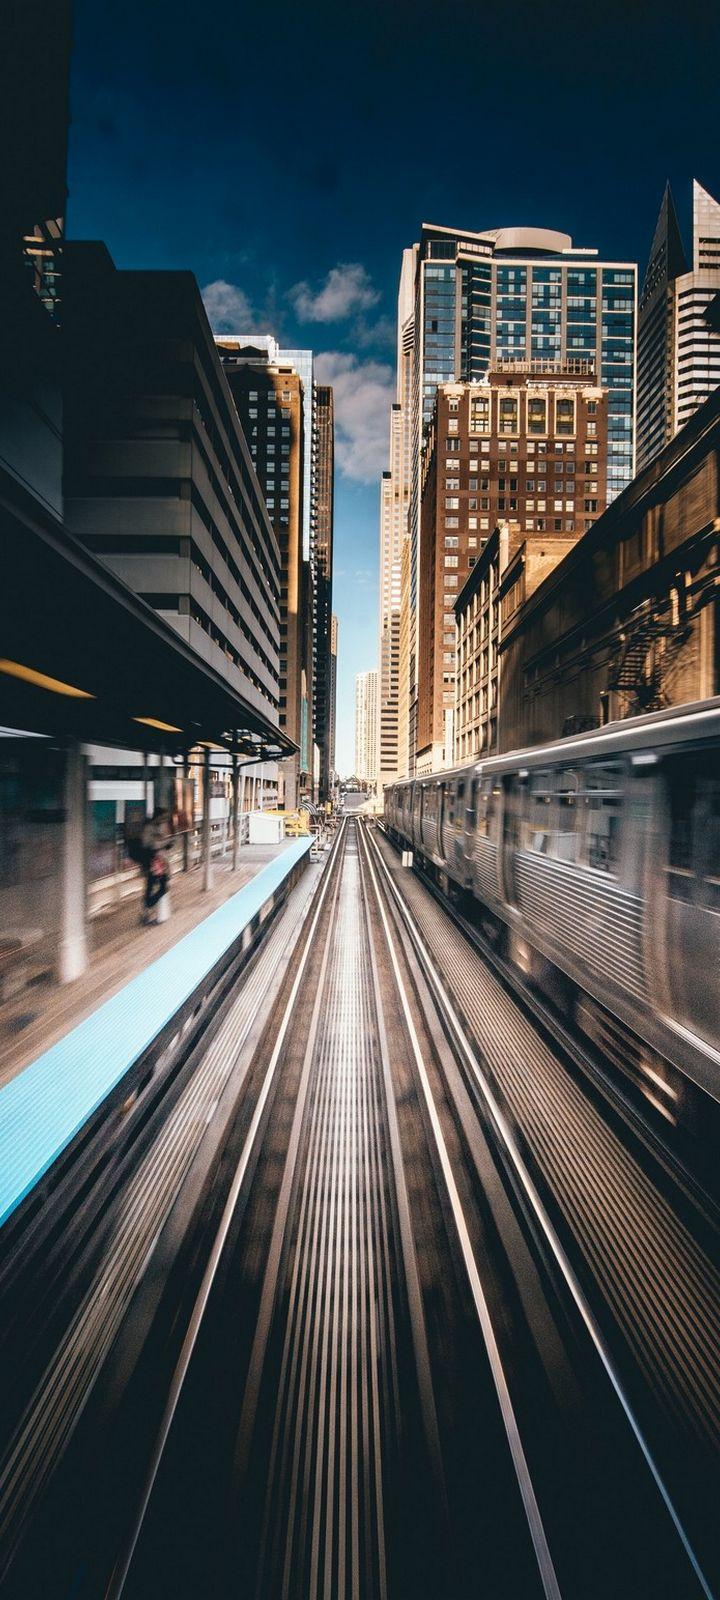 City Rails Railway Wallpaper 720x1600